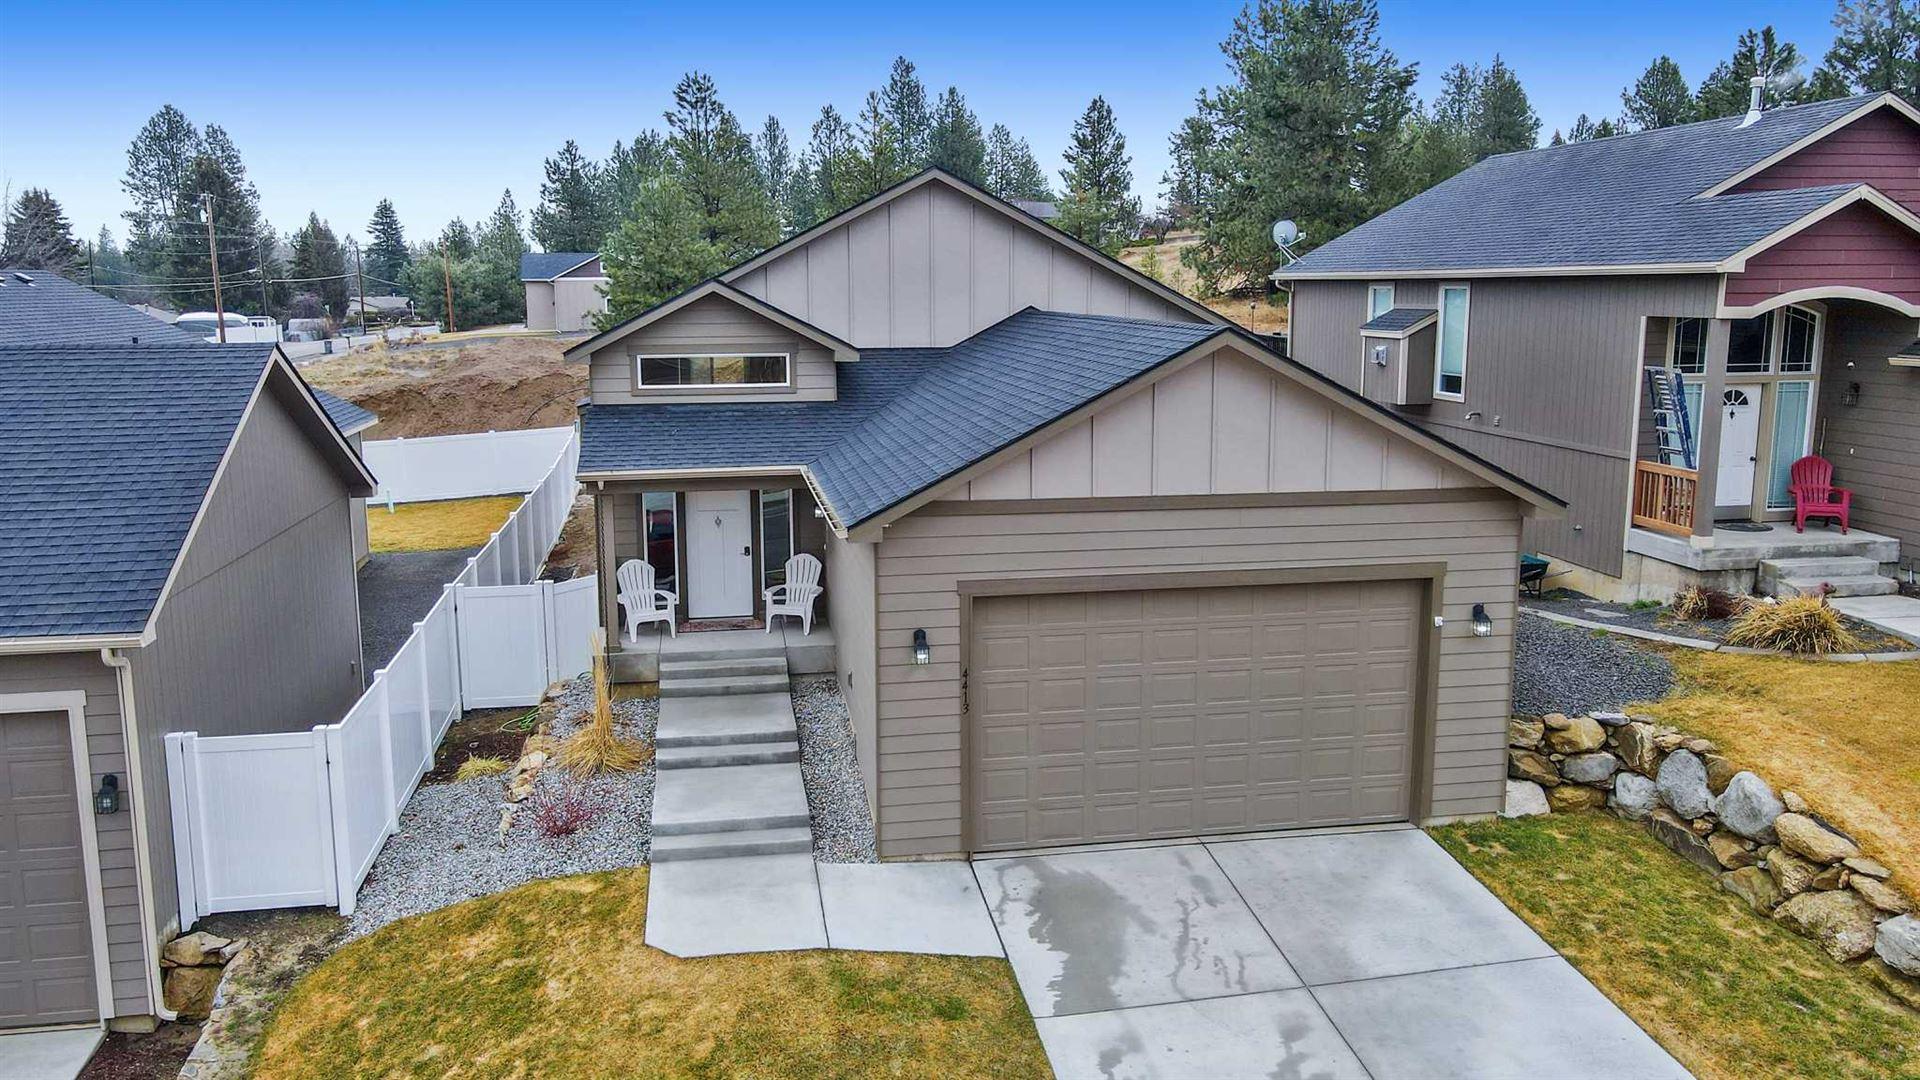 4413 S Ponderosa Ln, Spokane Valley, WA 99206-7066 - #: 202113153